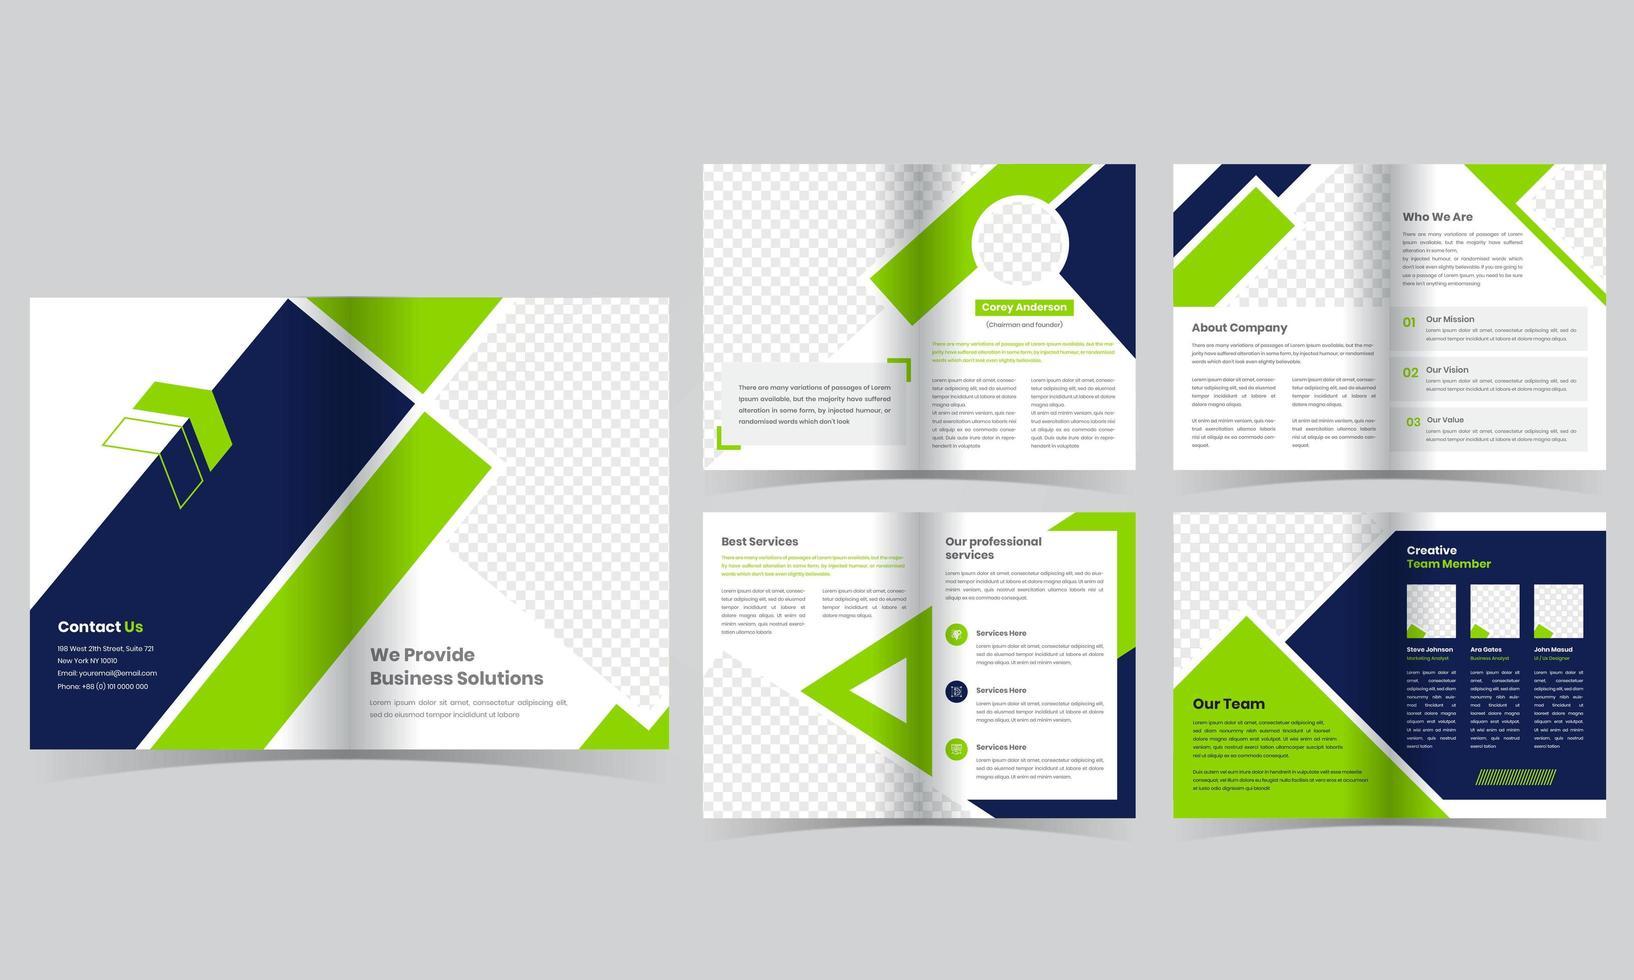 10-sida Green Business-broschyrmall vektor